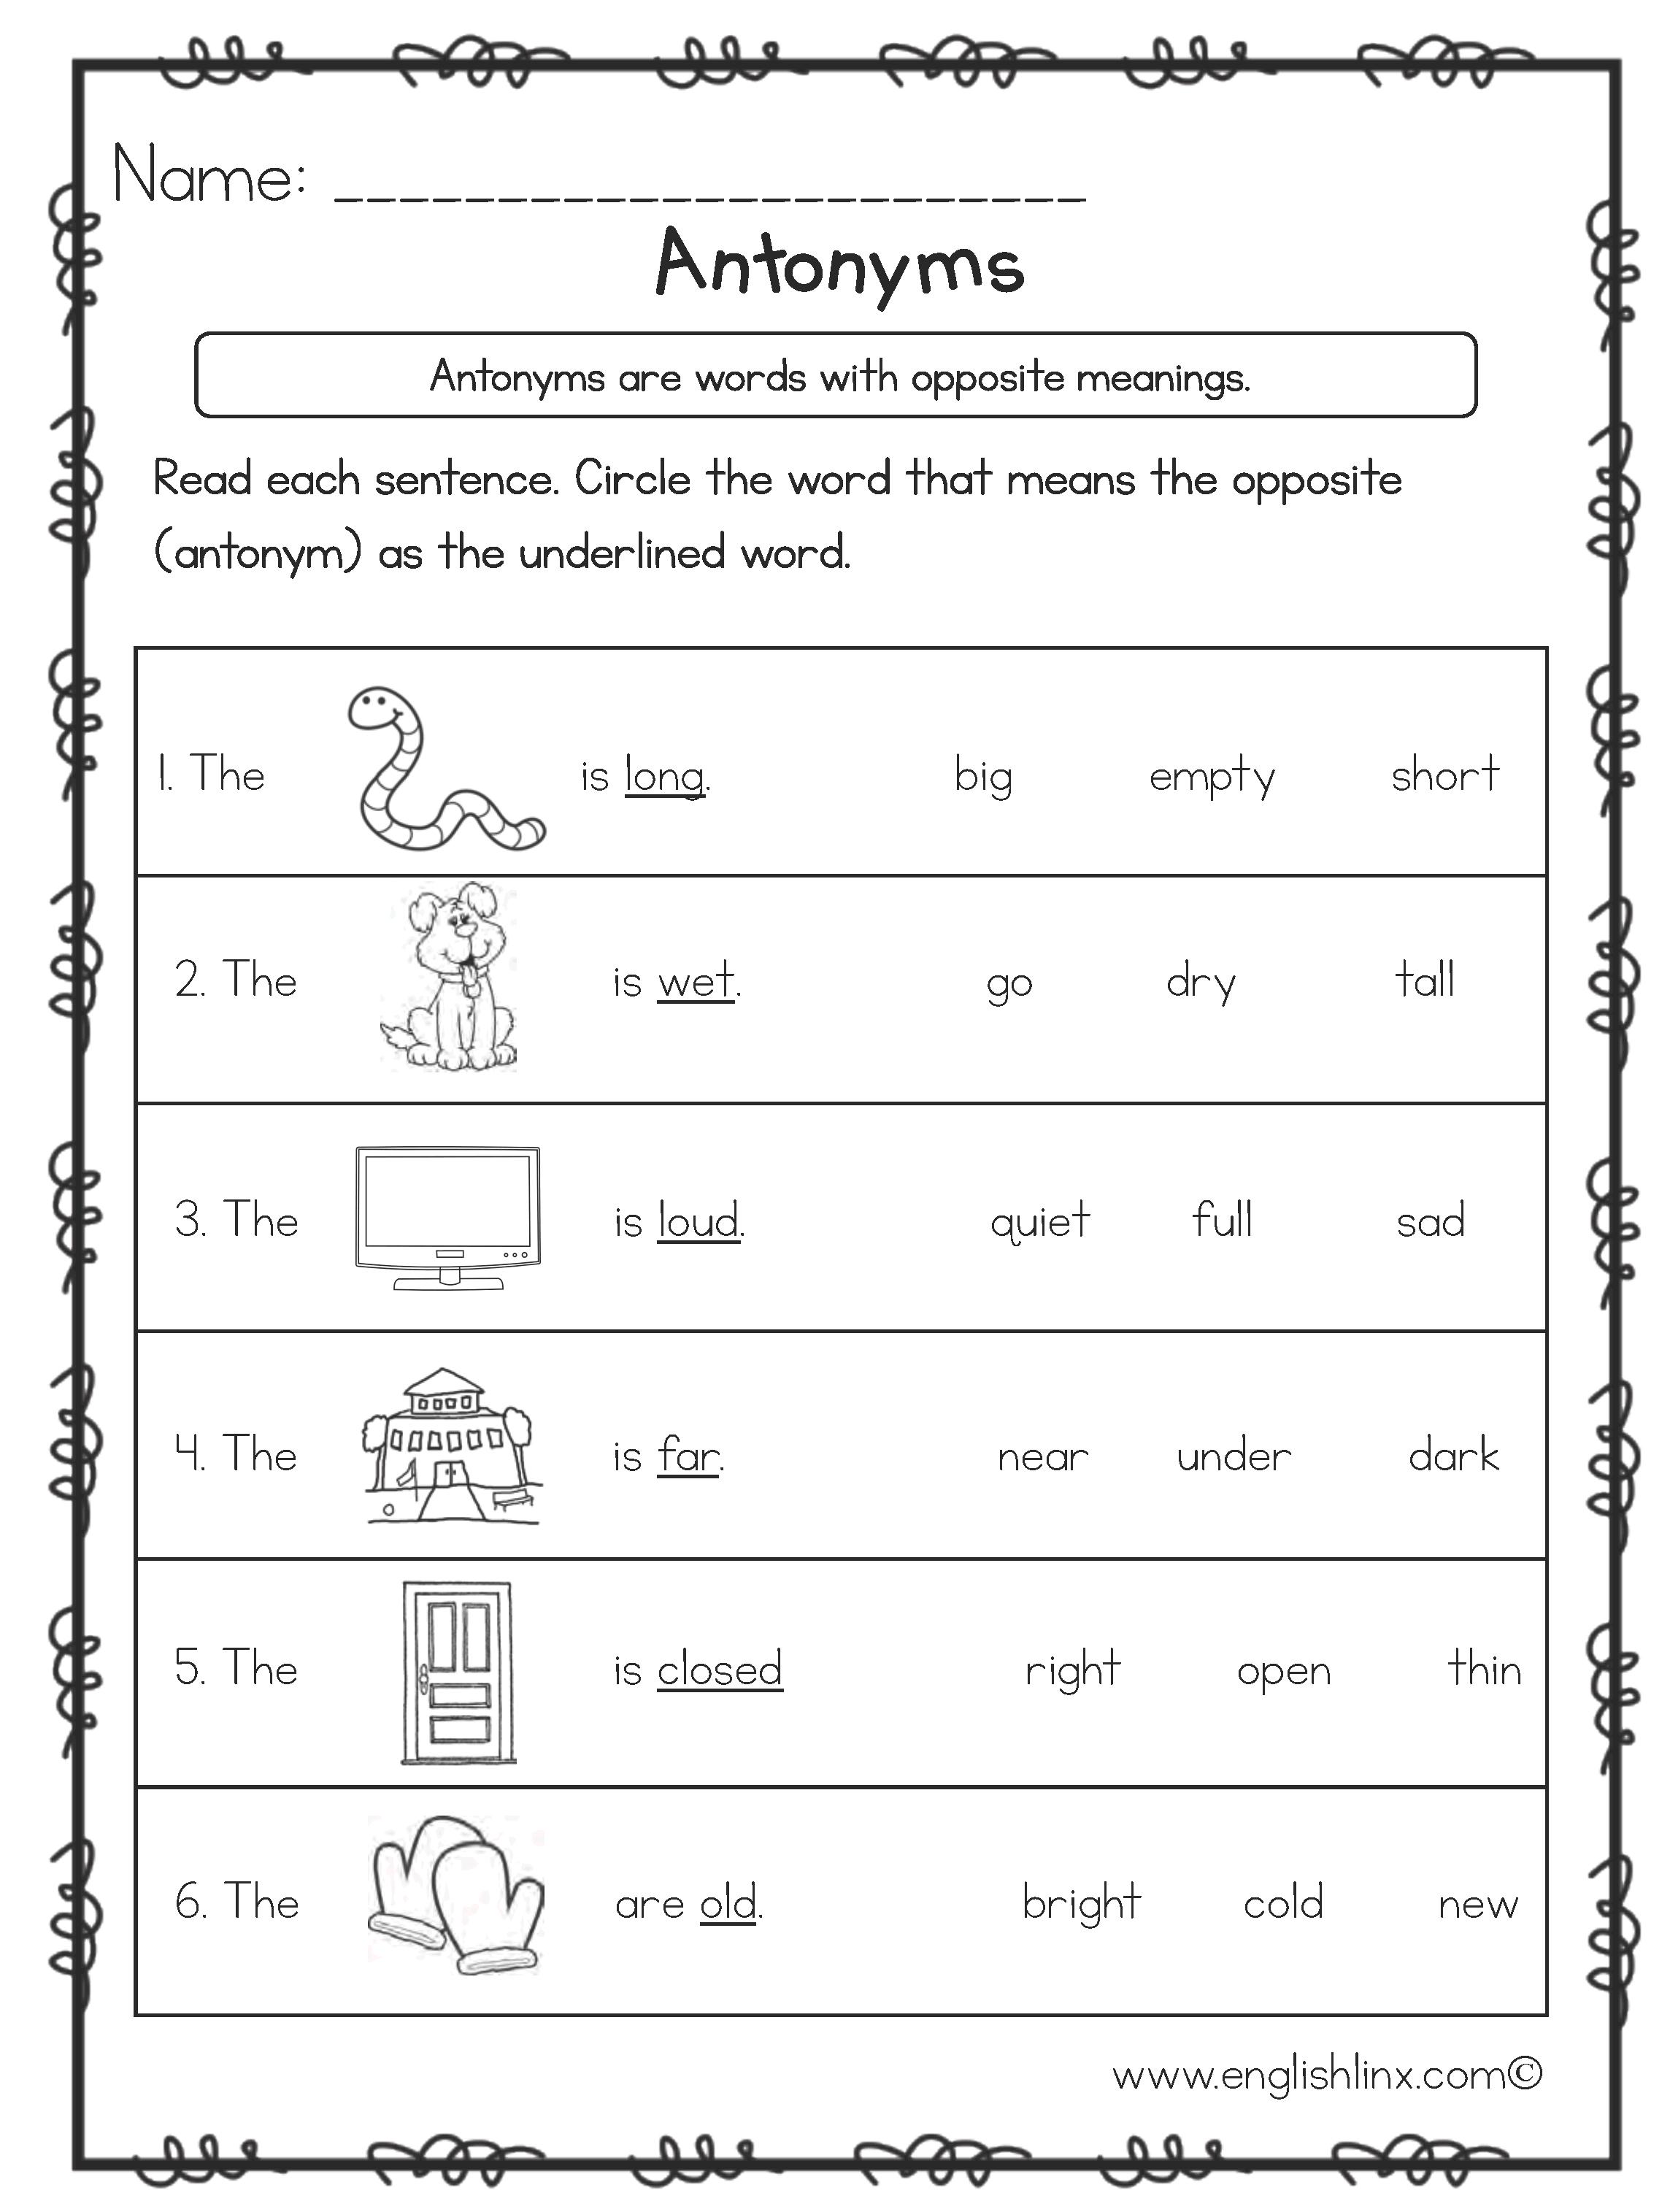 Englishlinx | Antonyms Worksheets | Free Printable Antonym Worksheets